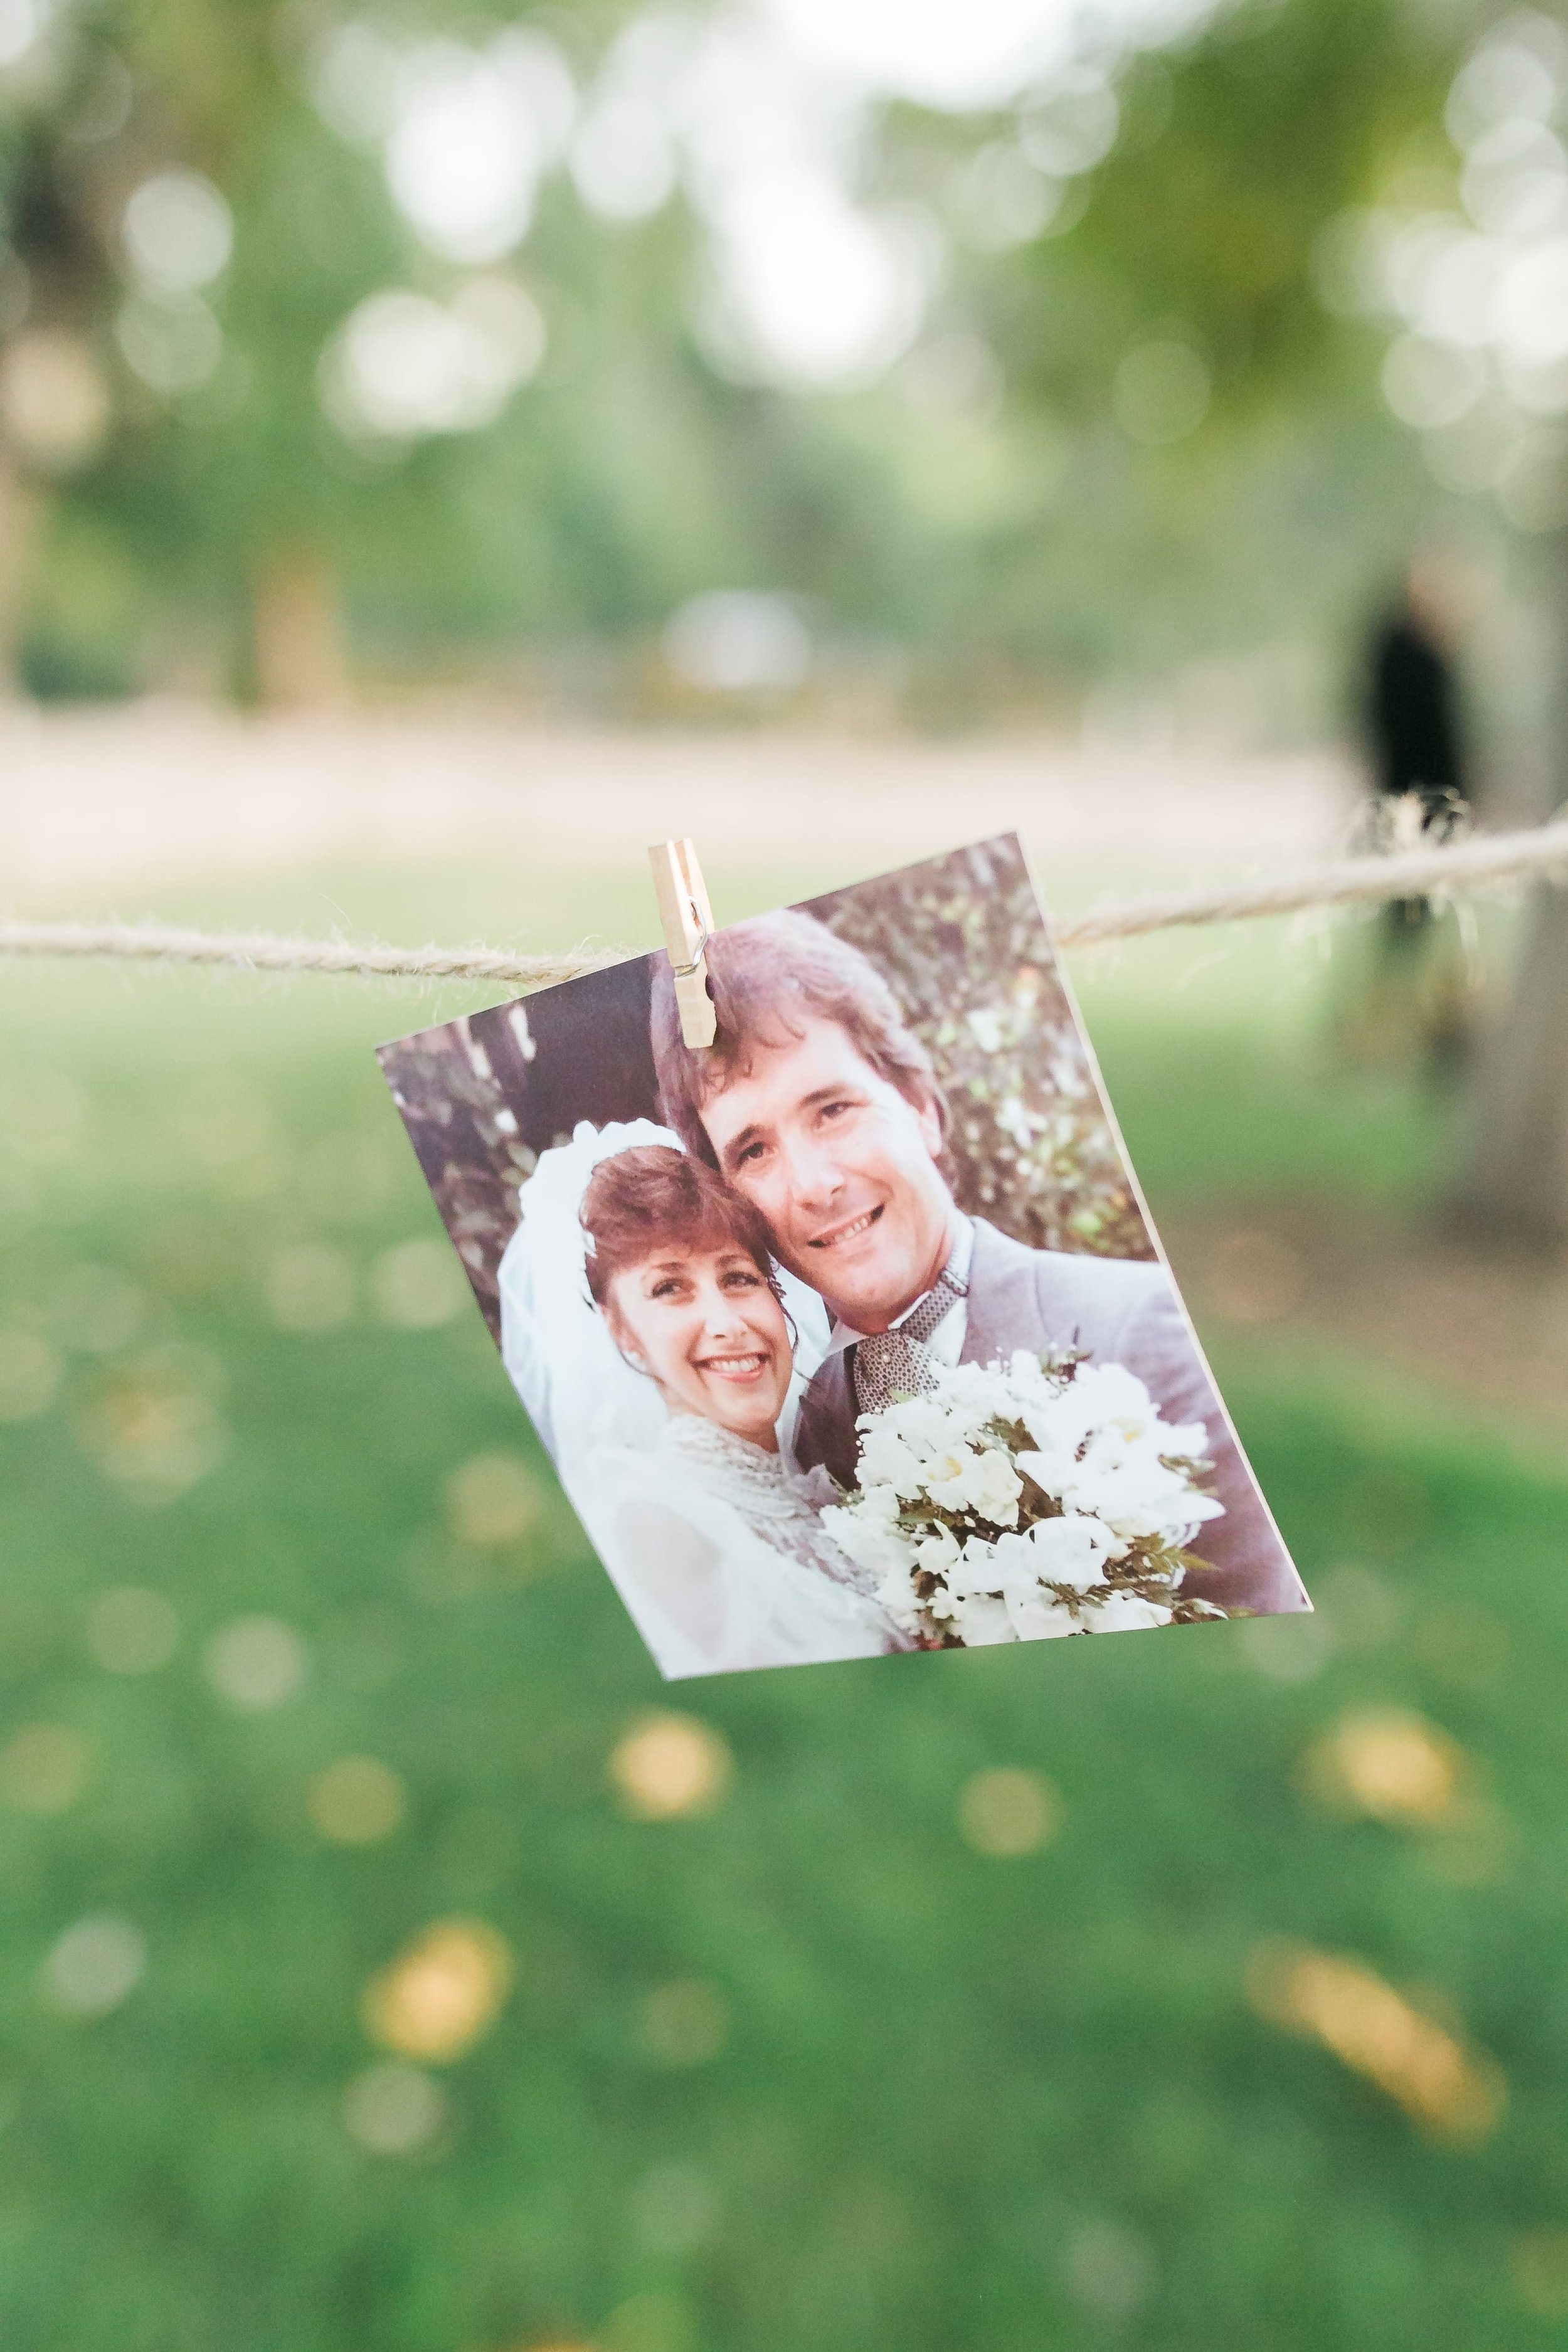 Tara Nichole Photo - Intimate Wedding Photographer Phoenix - Phoenix Photographer.jpg